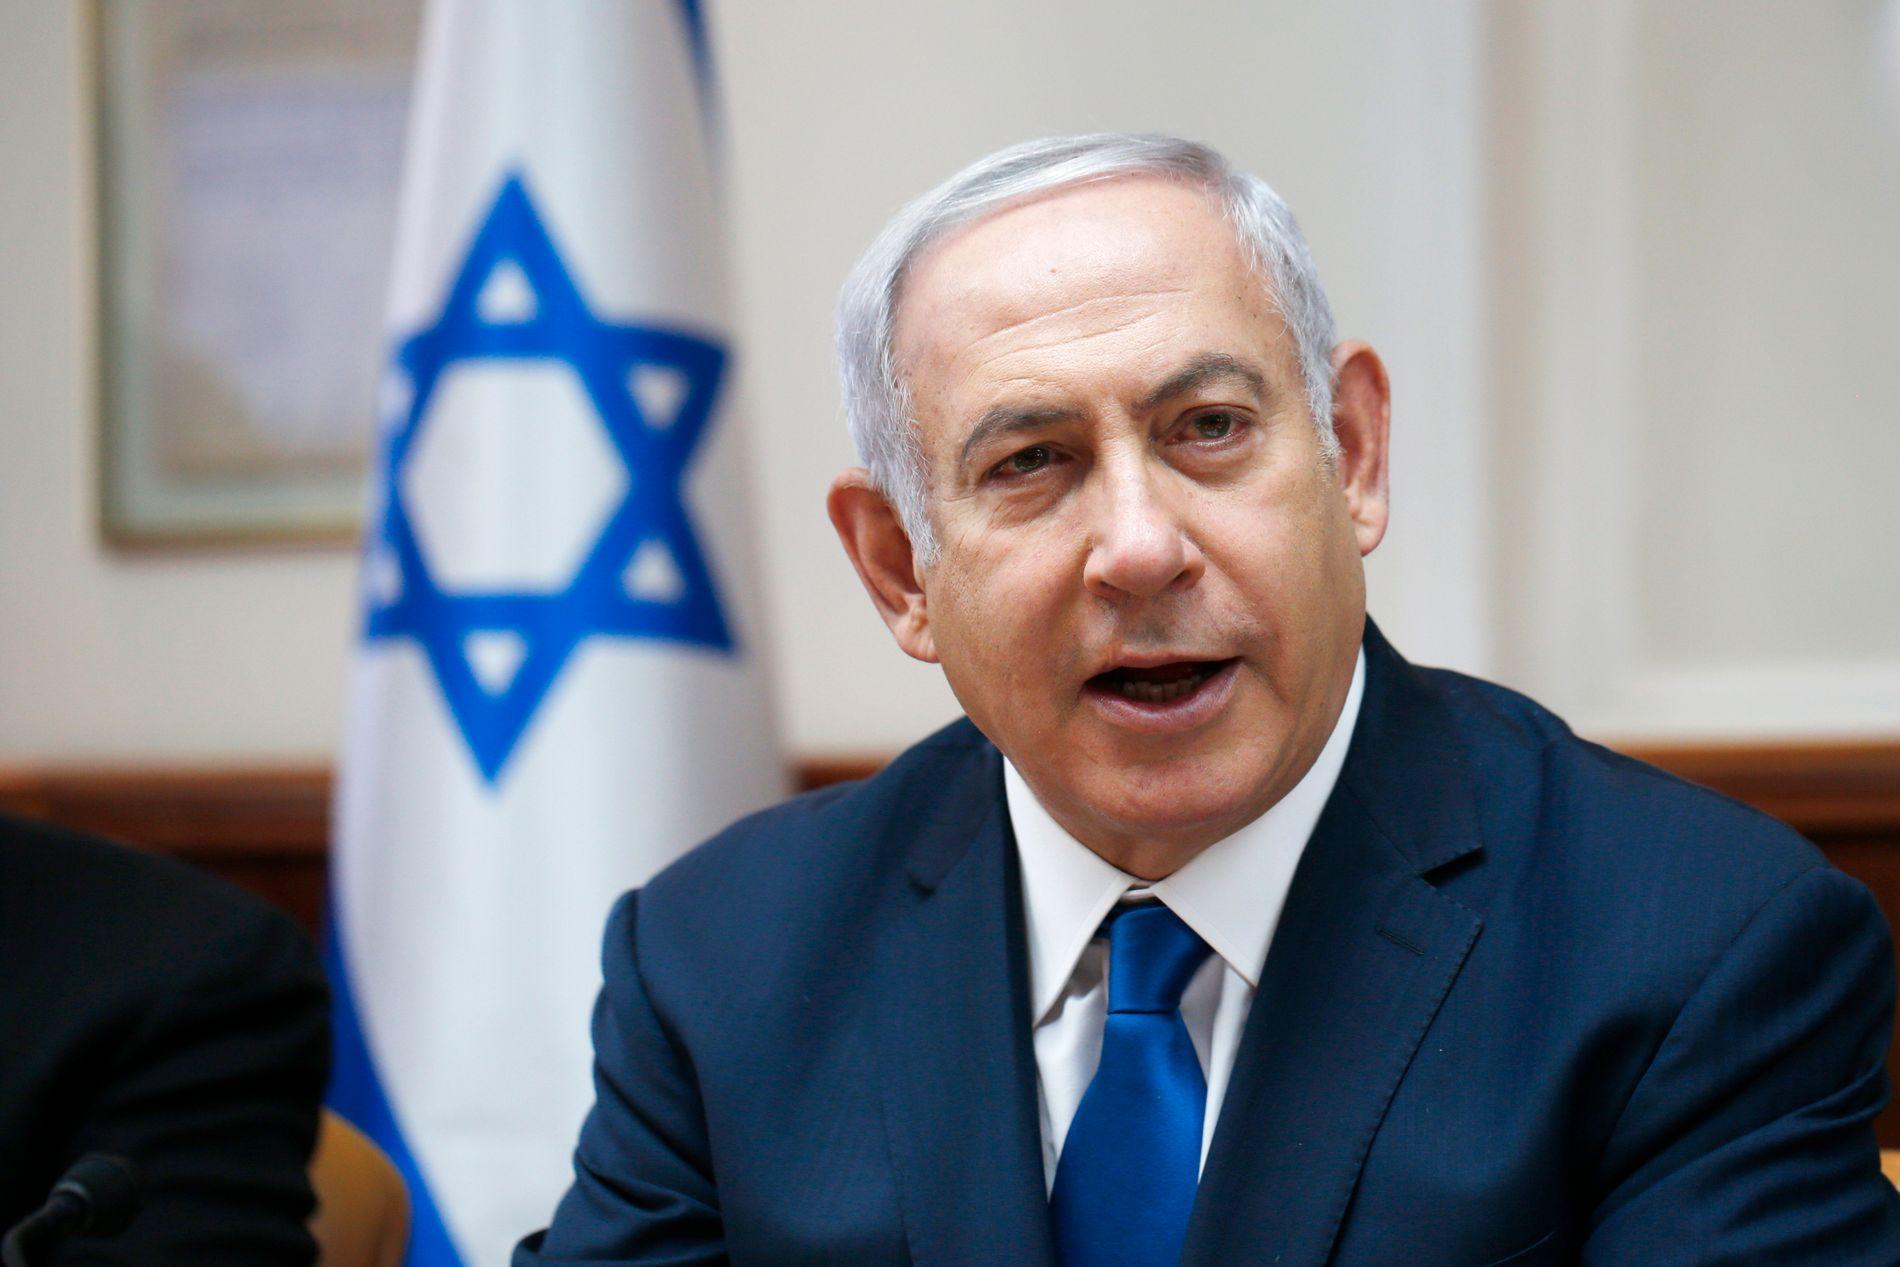 FORNØYD MED NY LOV: Israels statsminister Benjamin Netanyahu er fornøyd med landets nye lov.